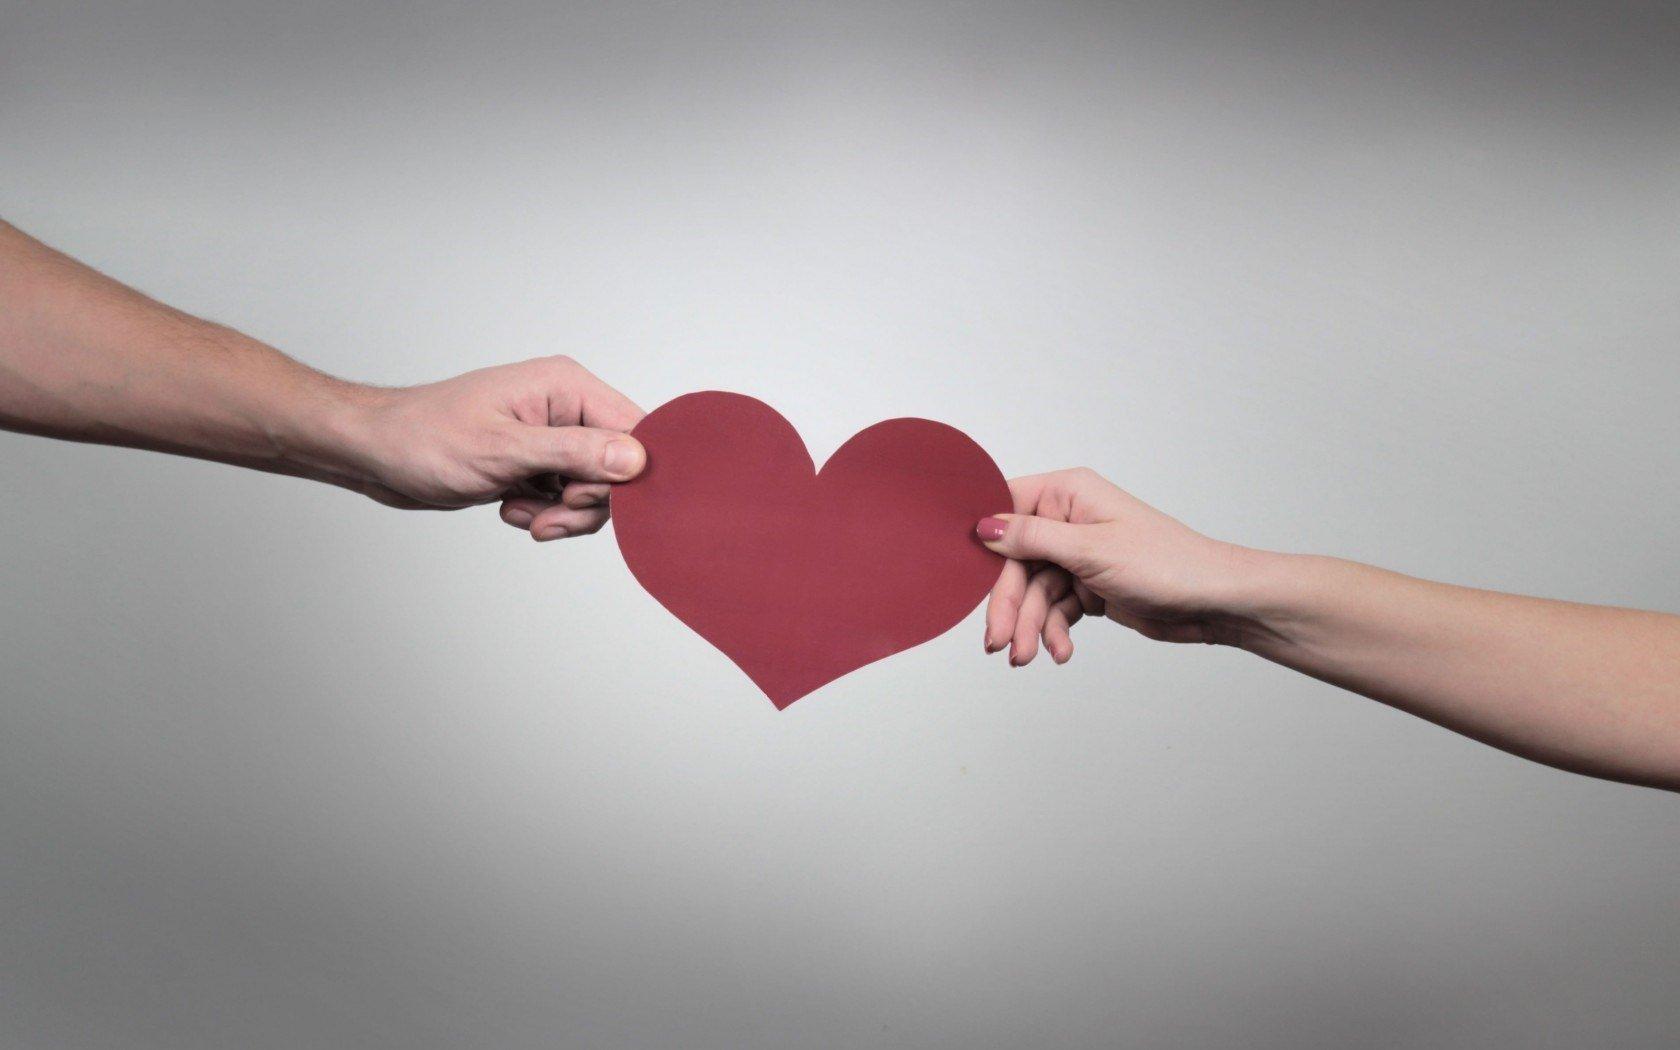 6925637-man-woman-couple-mood-heart-paper-love-feelings-hands